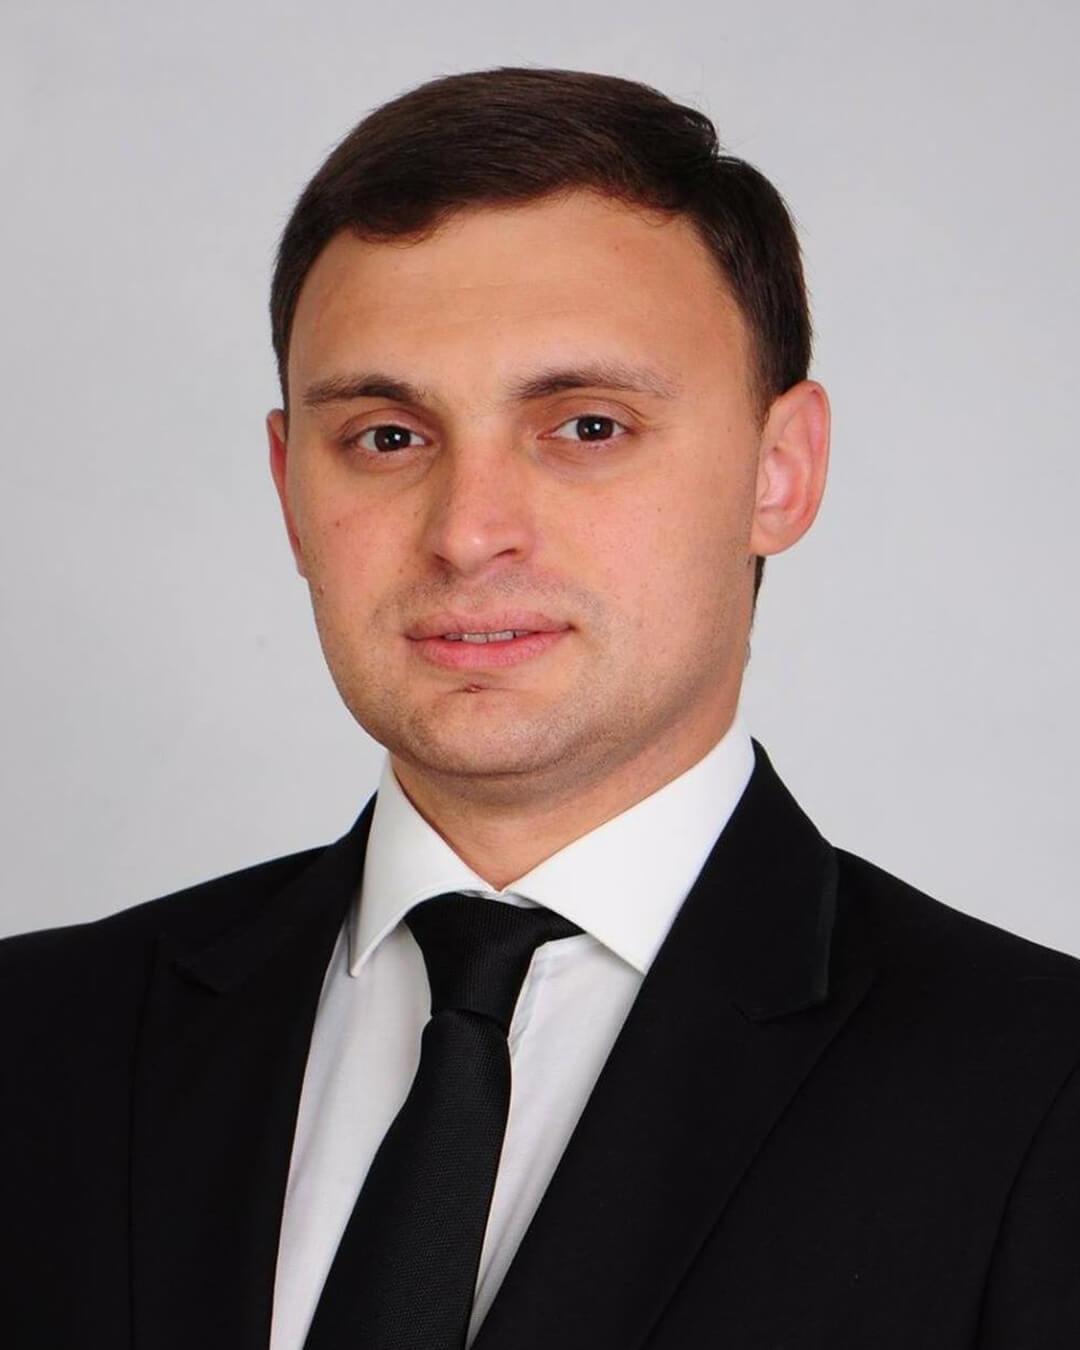 Штельмах Виталий Витальевич